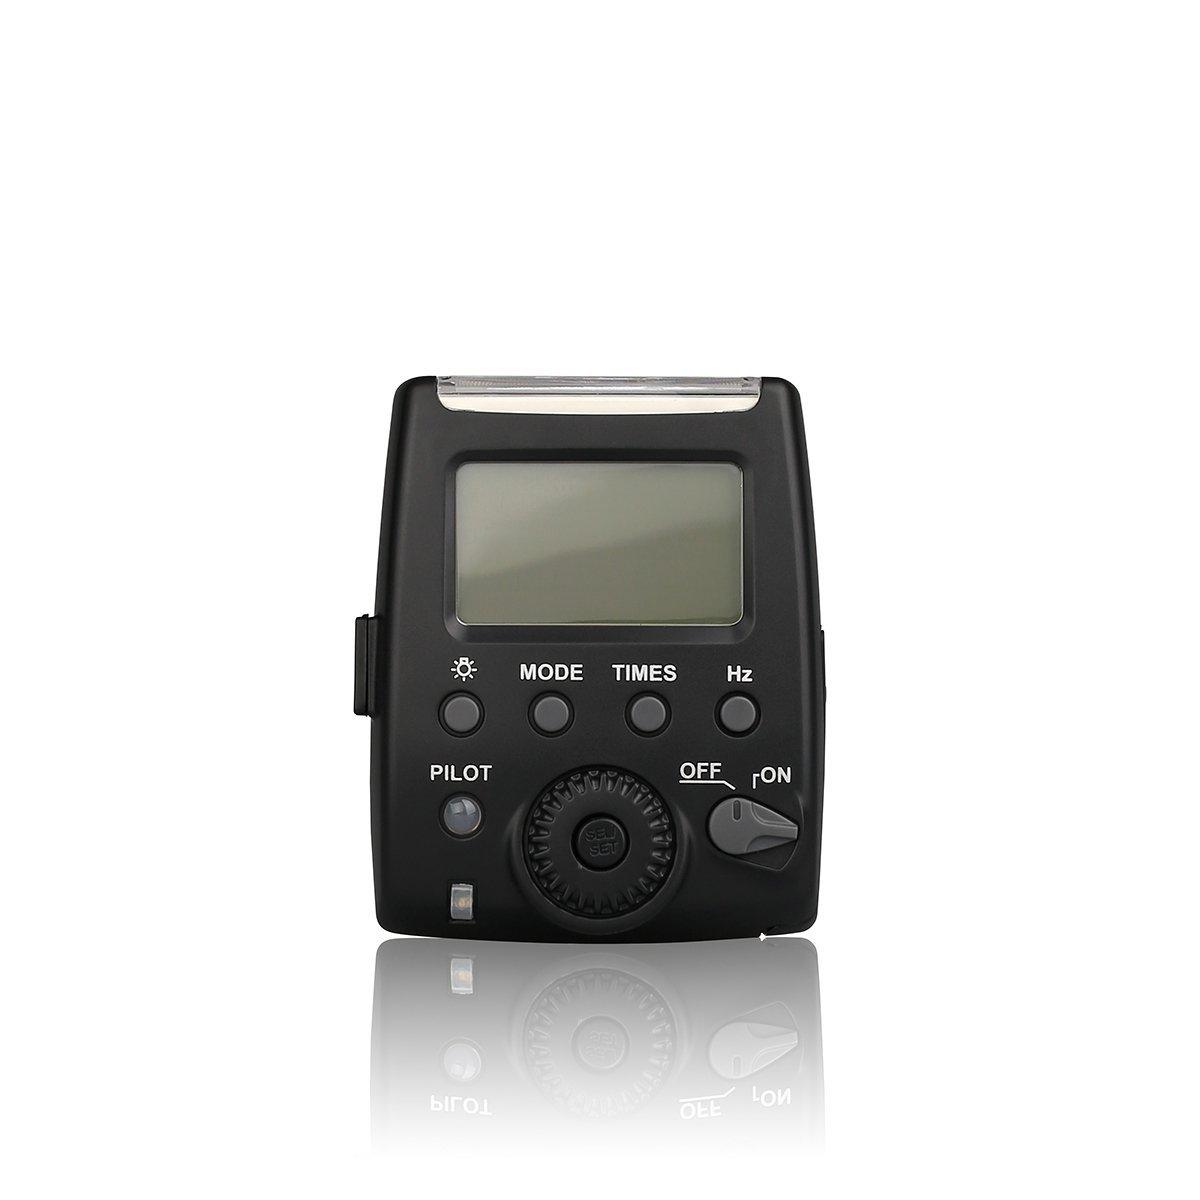 Meike MK-300C Mini LCD Screen E-TTL TTL On-camera Speedlite Flash Light for Canon 5D Mark III II 60D DSLR Camera (with Mini USB Interface)